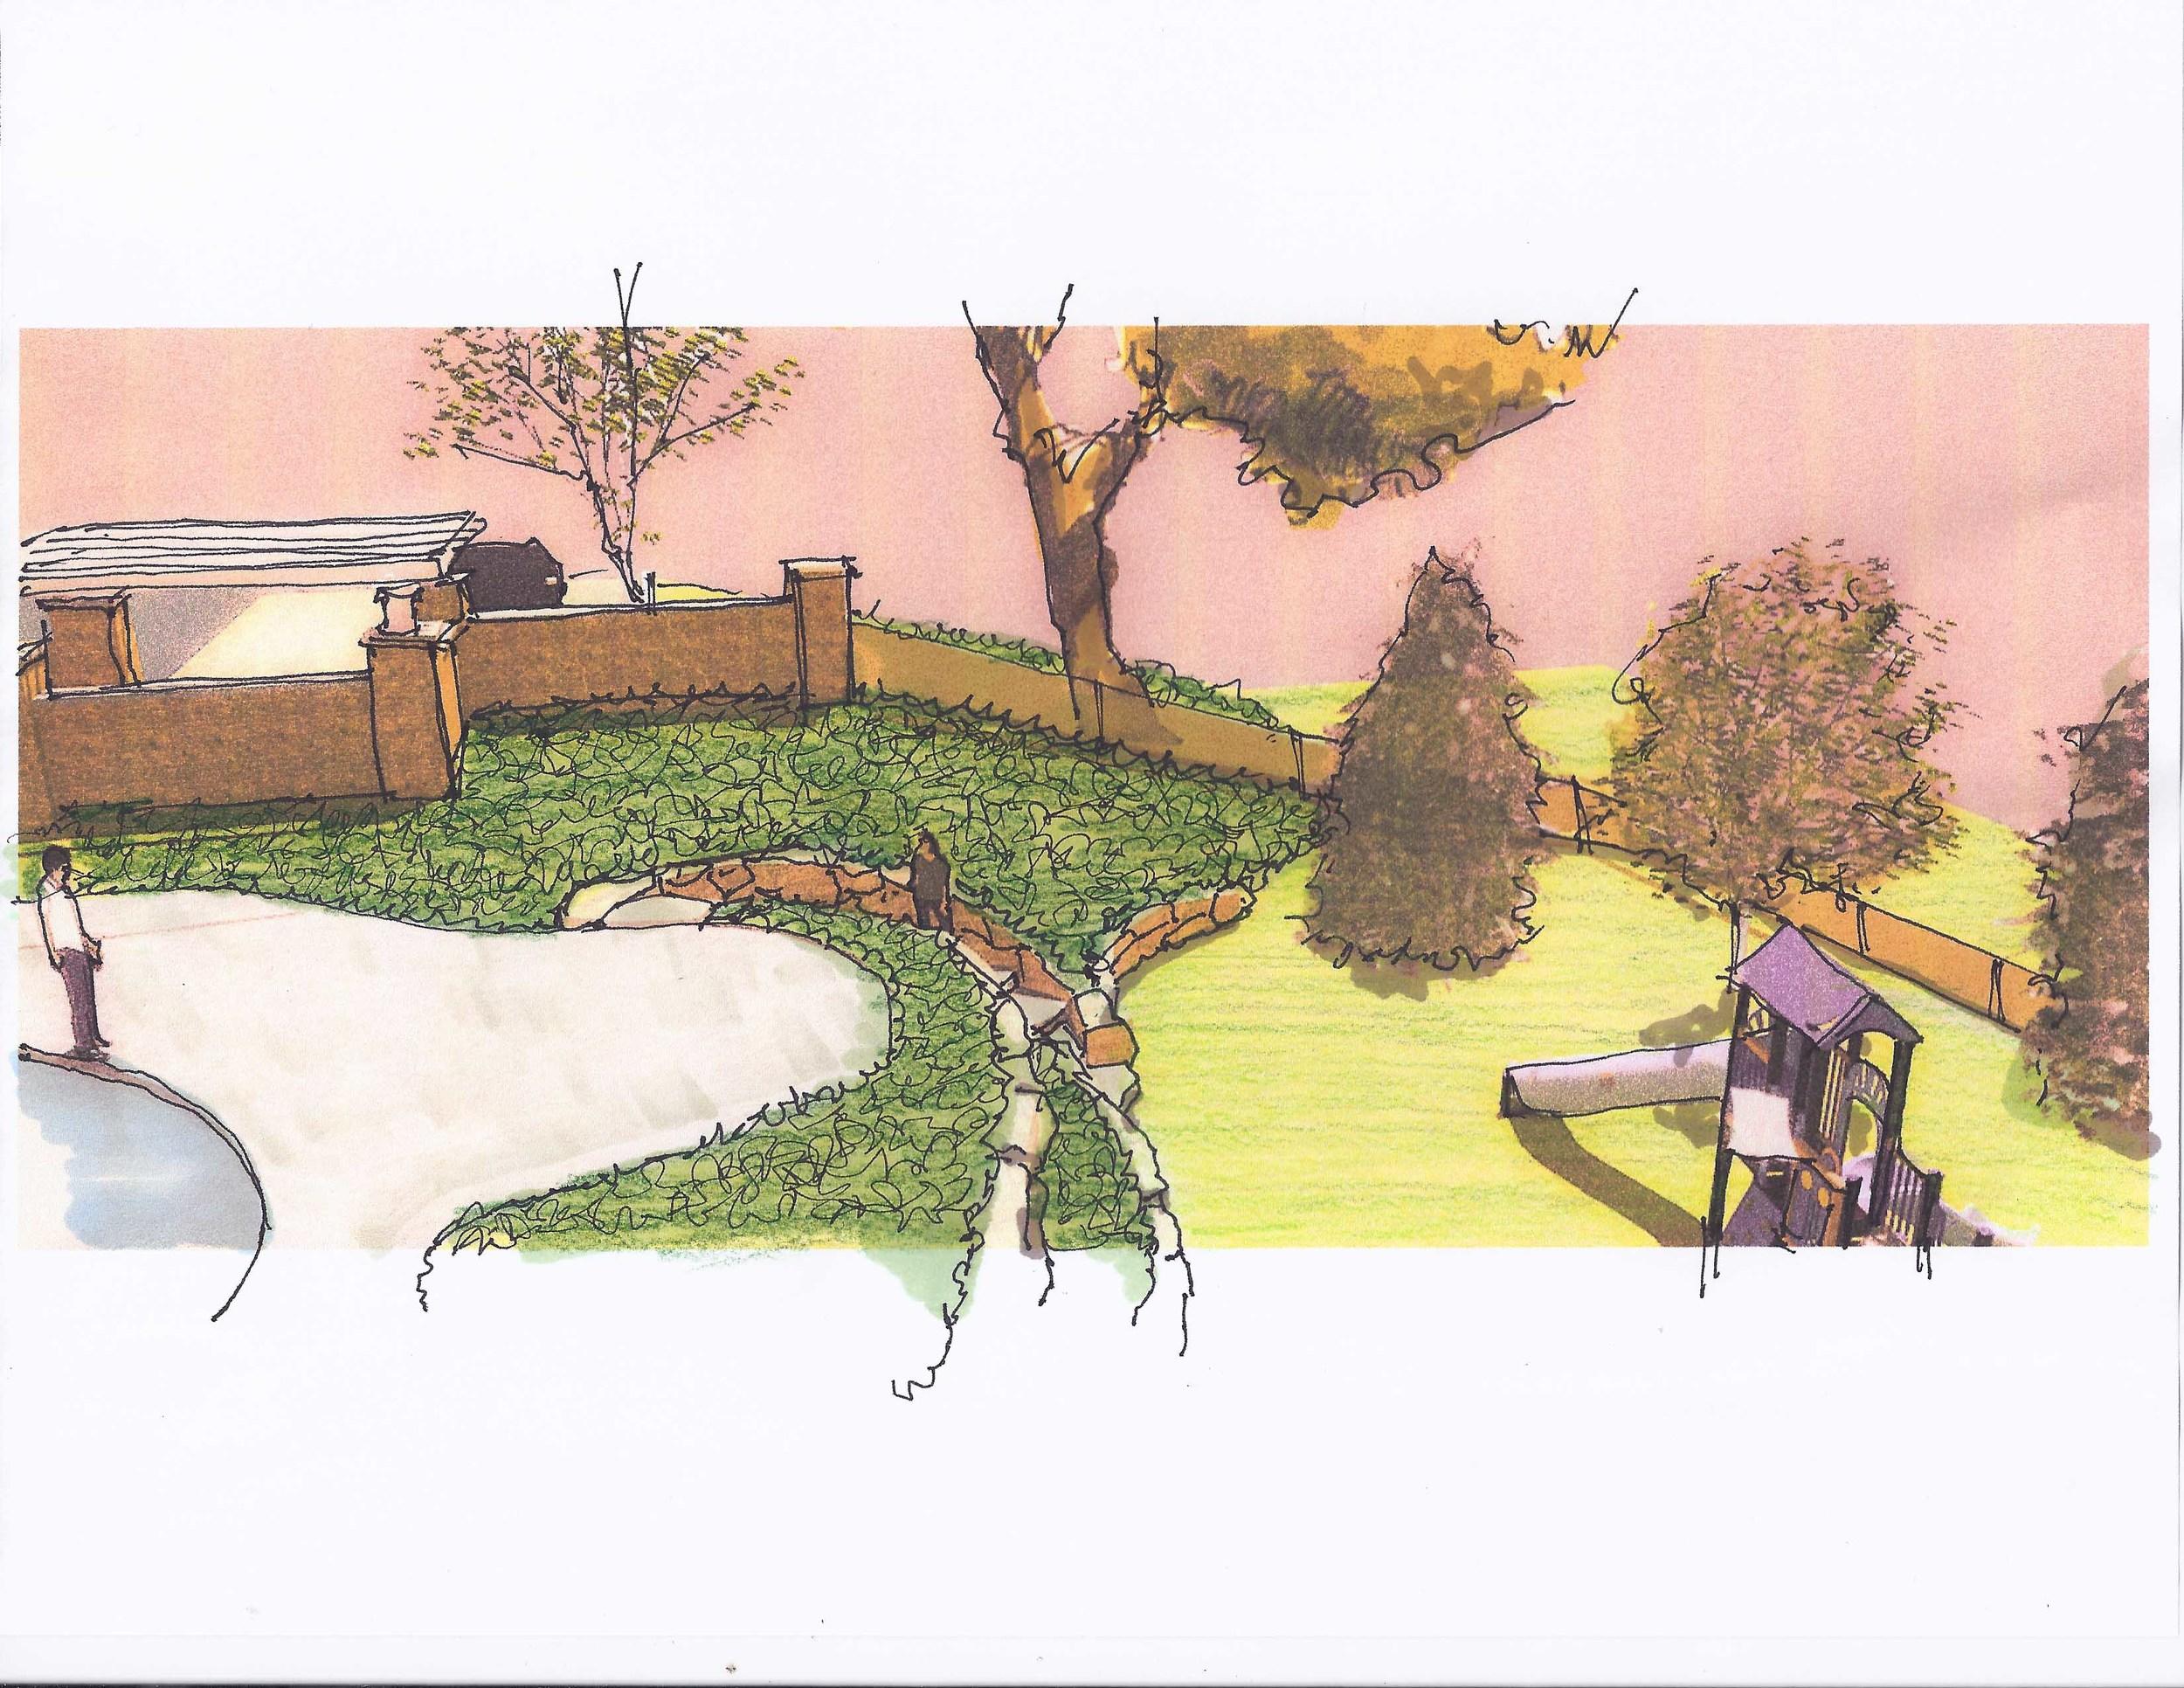 Manhasset Play Area Concept - Render 3